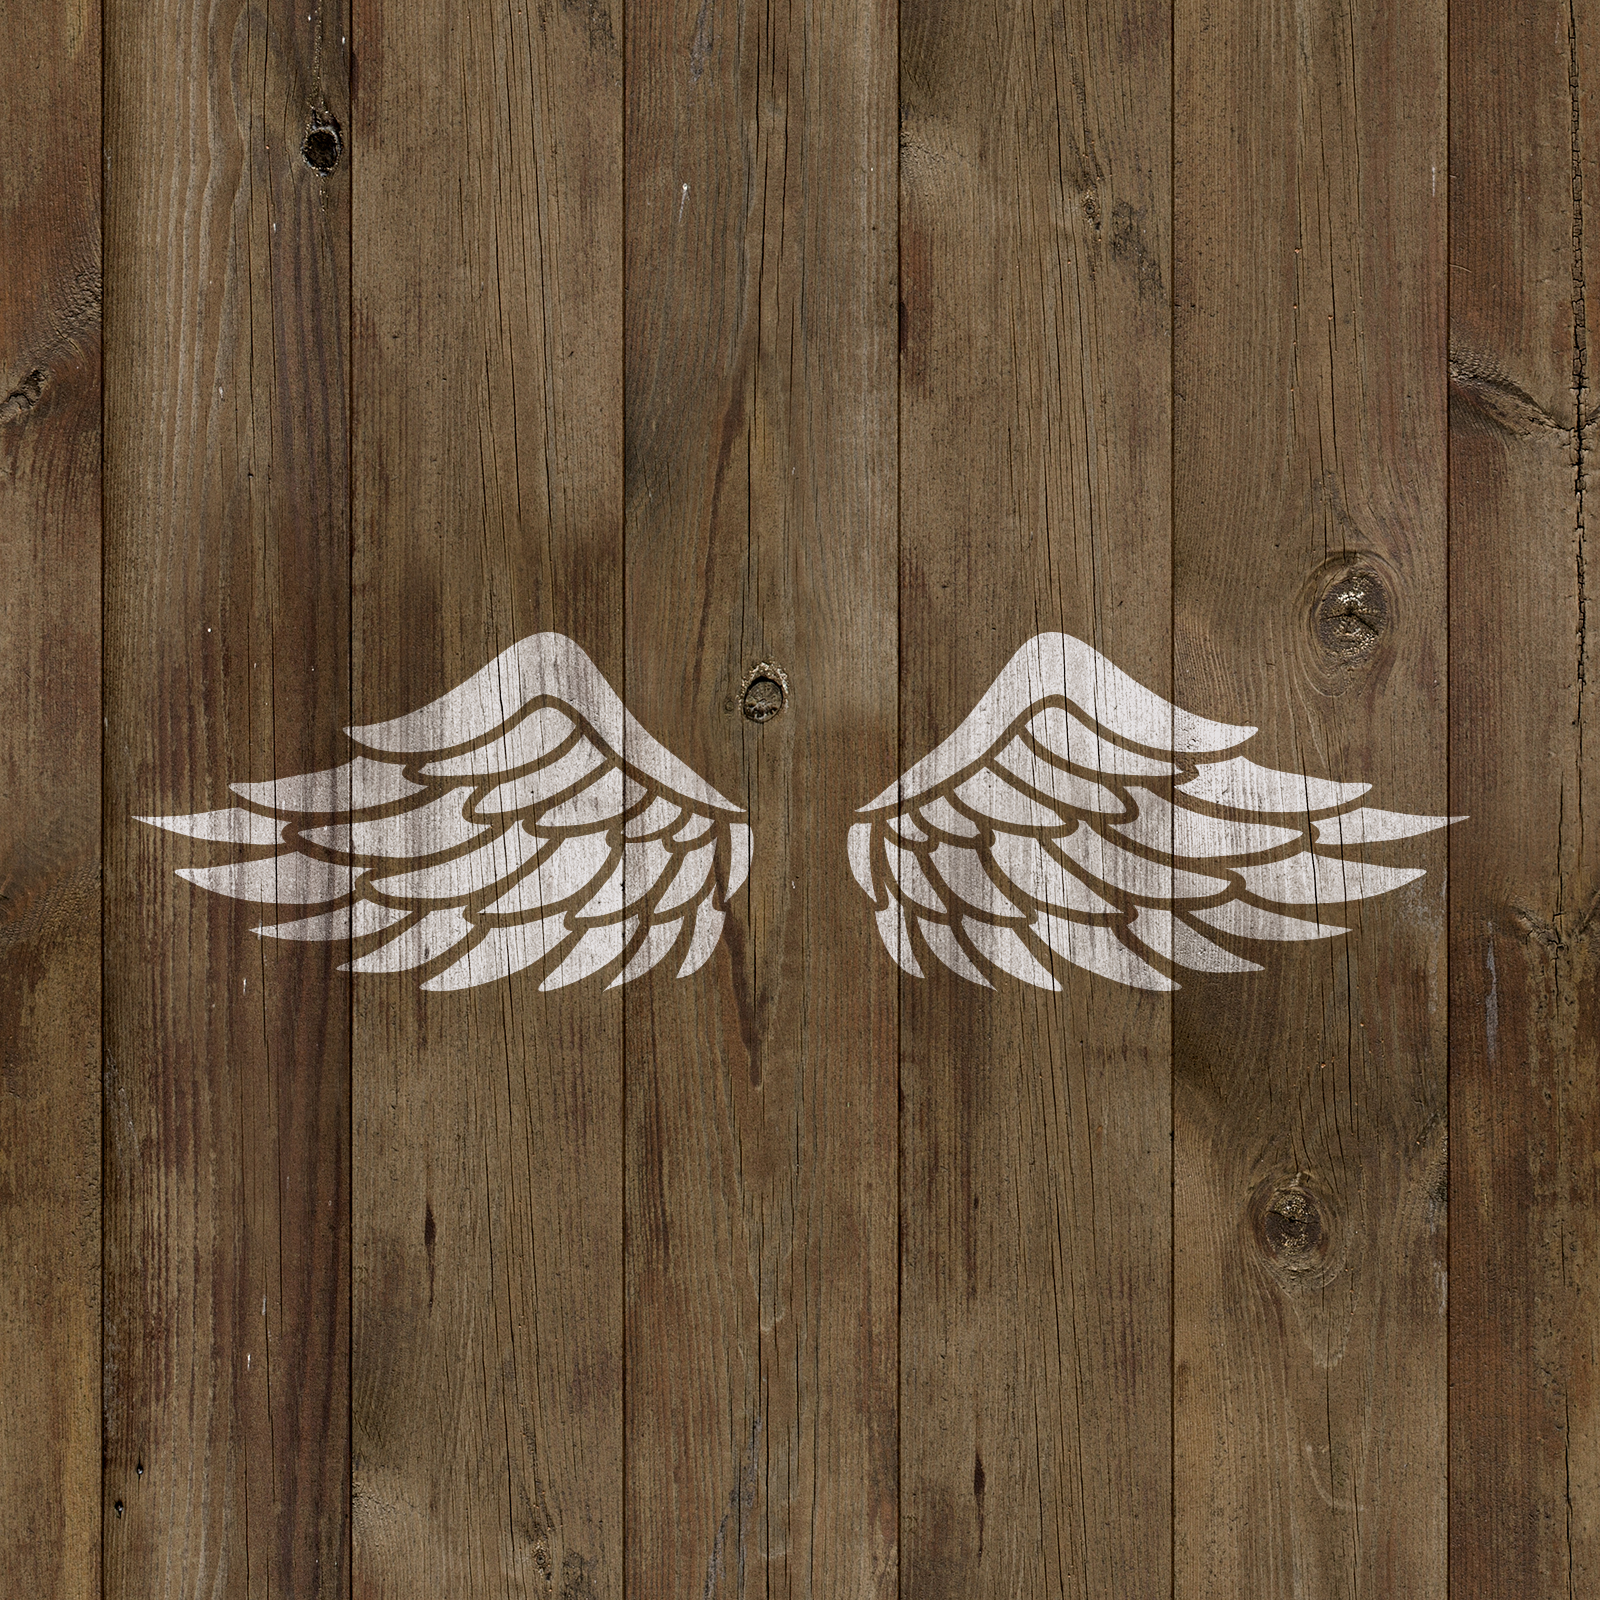 Wings Stencil - Durable & Reusable Mylar Stencils